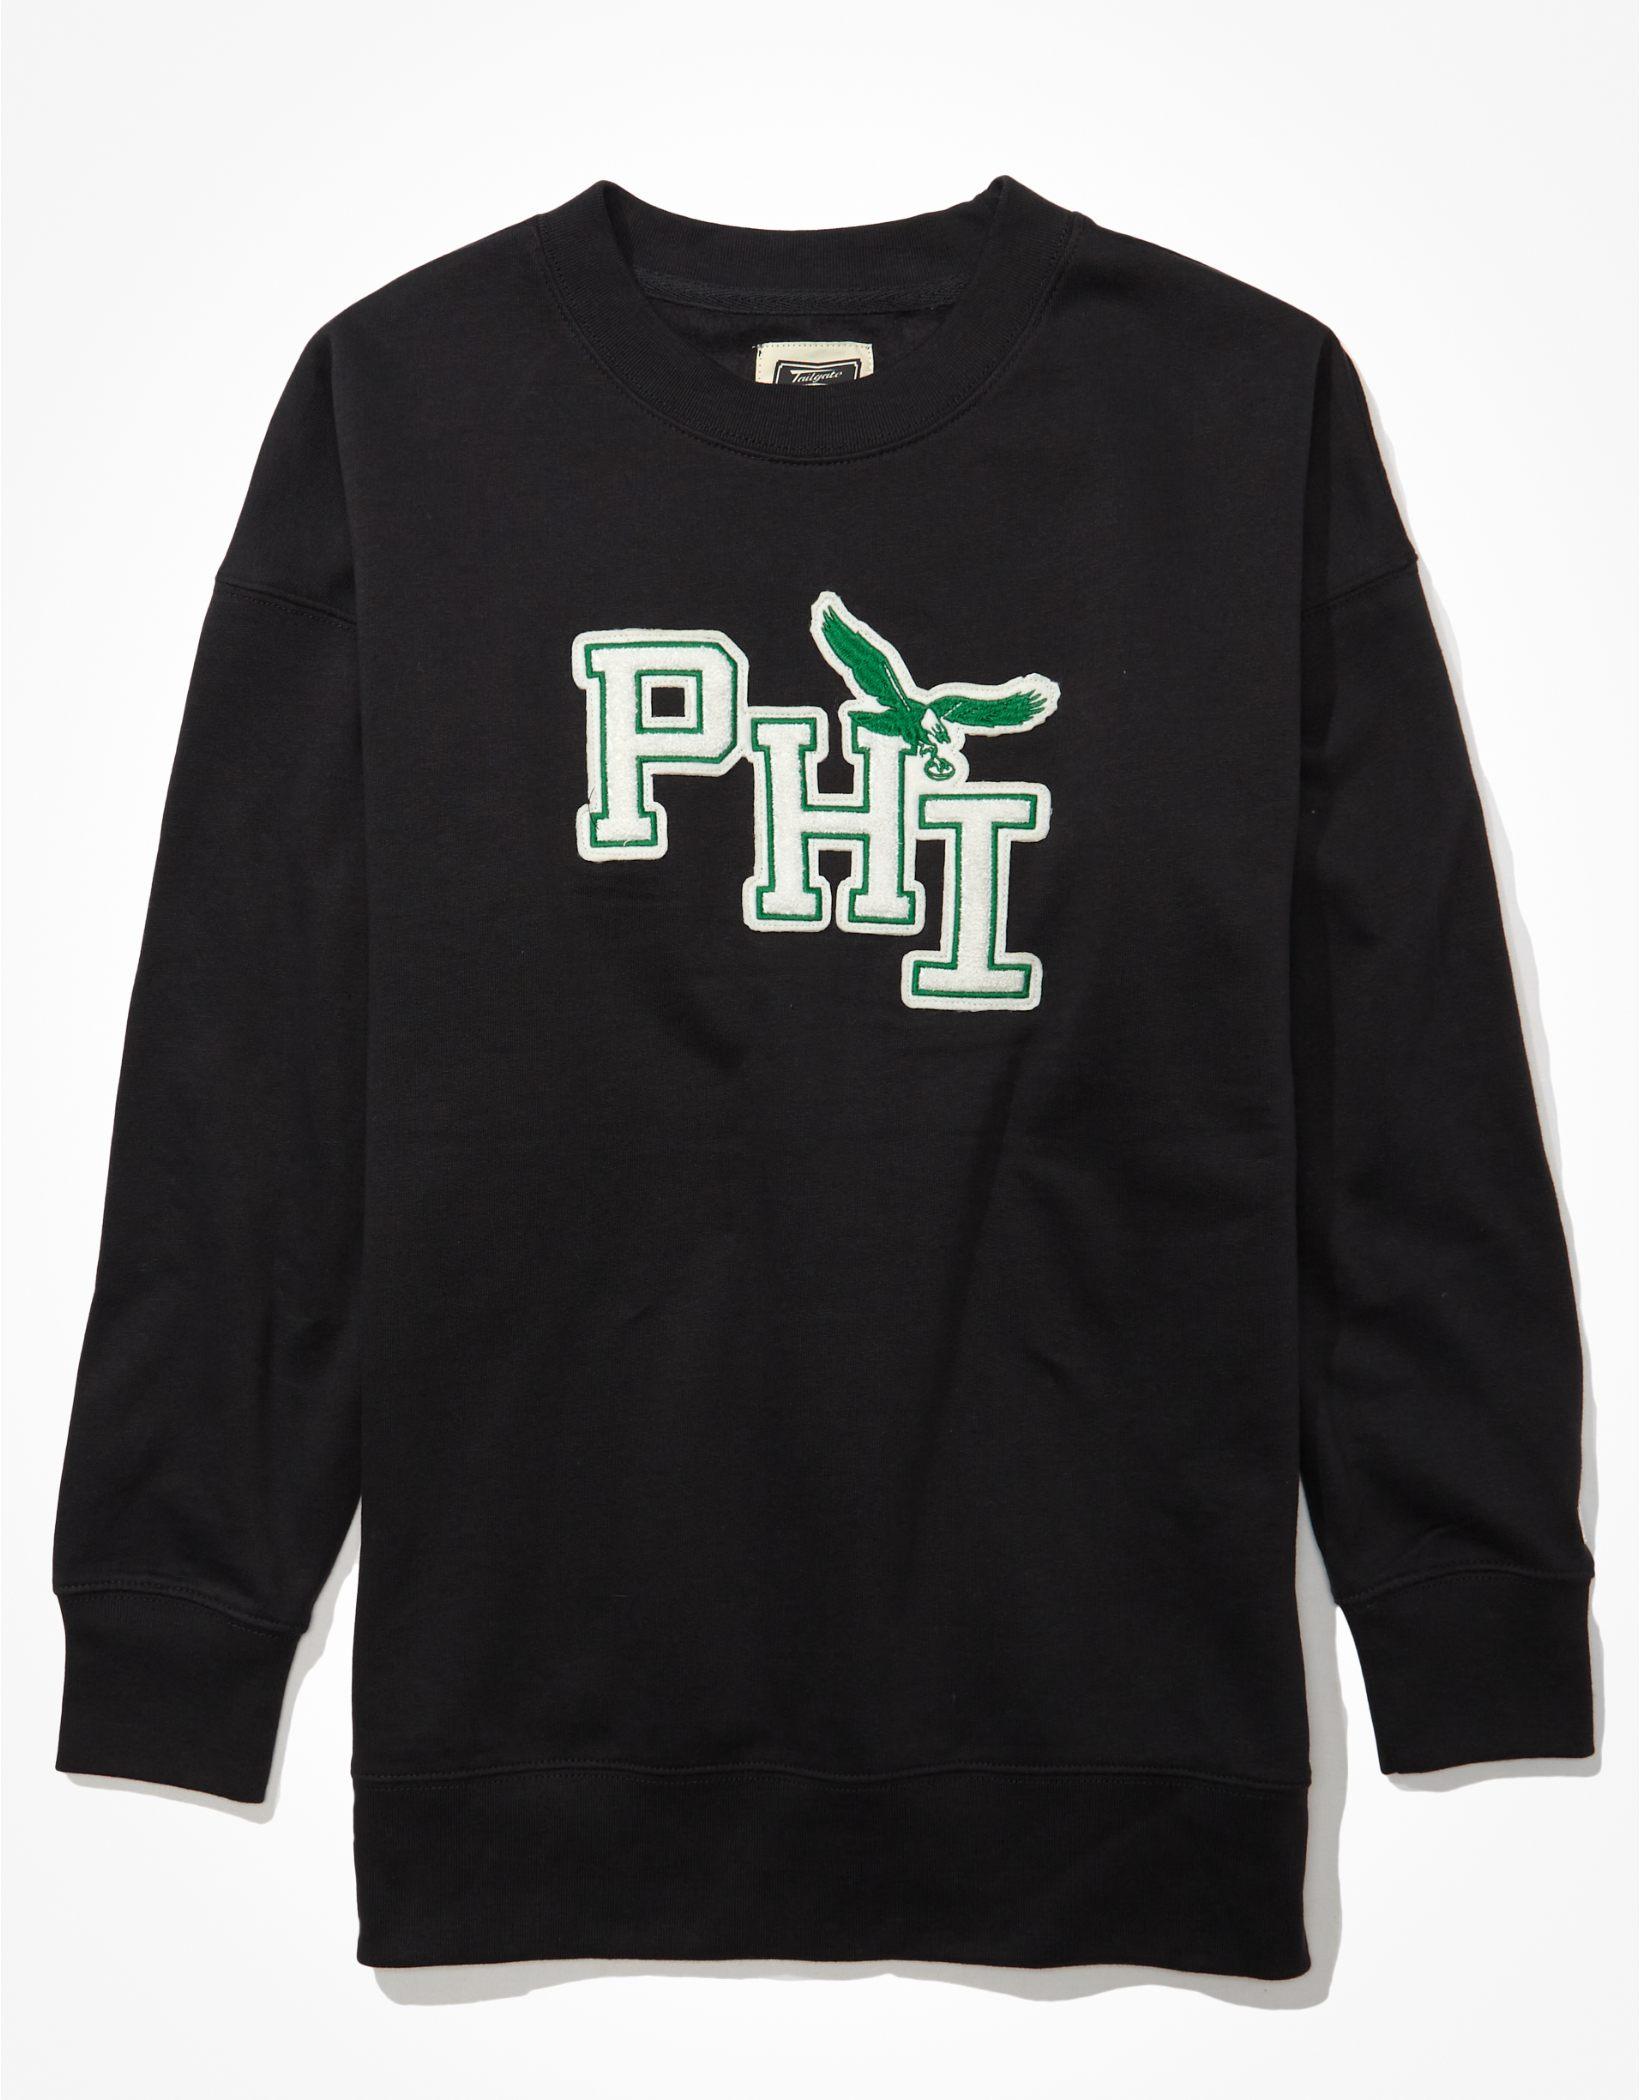 Tailgate Women's Philadelphia Eagles Oversized Sweatshirt